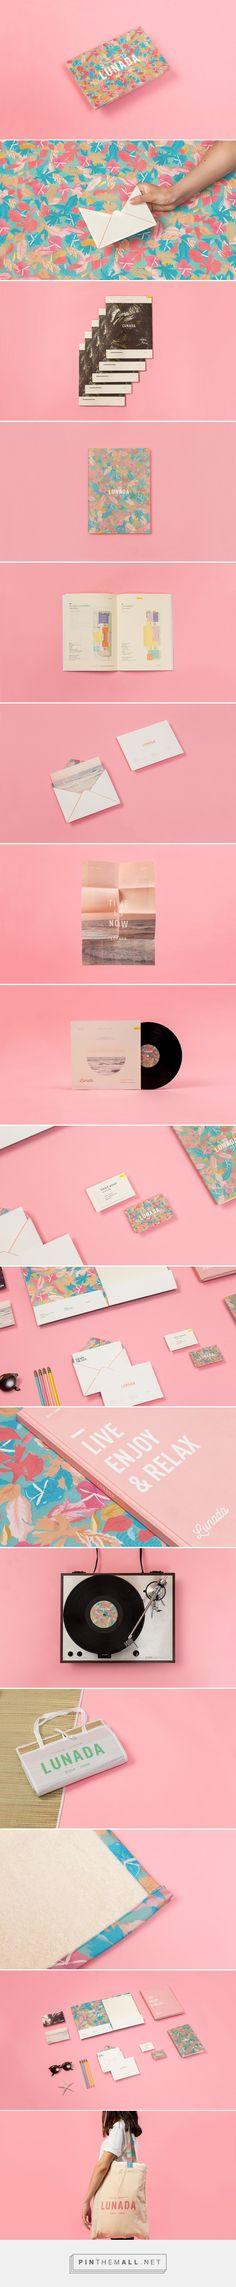 Lunada Branding on Behance   Fivestar Branding – Design and Branding Agency & Inspiration Gallery